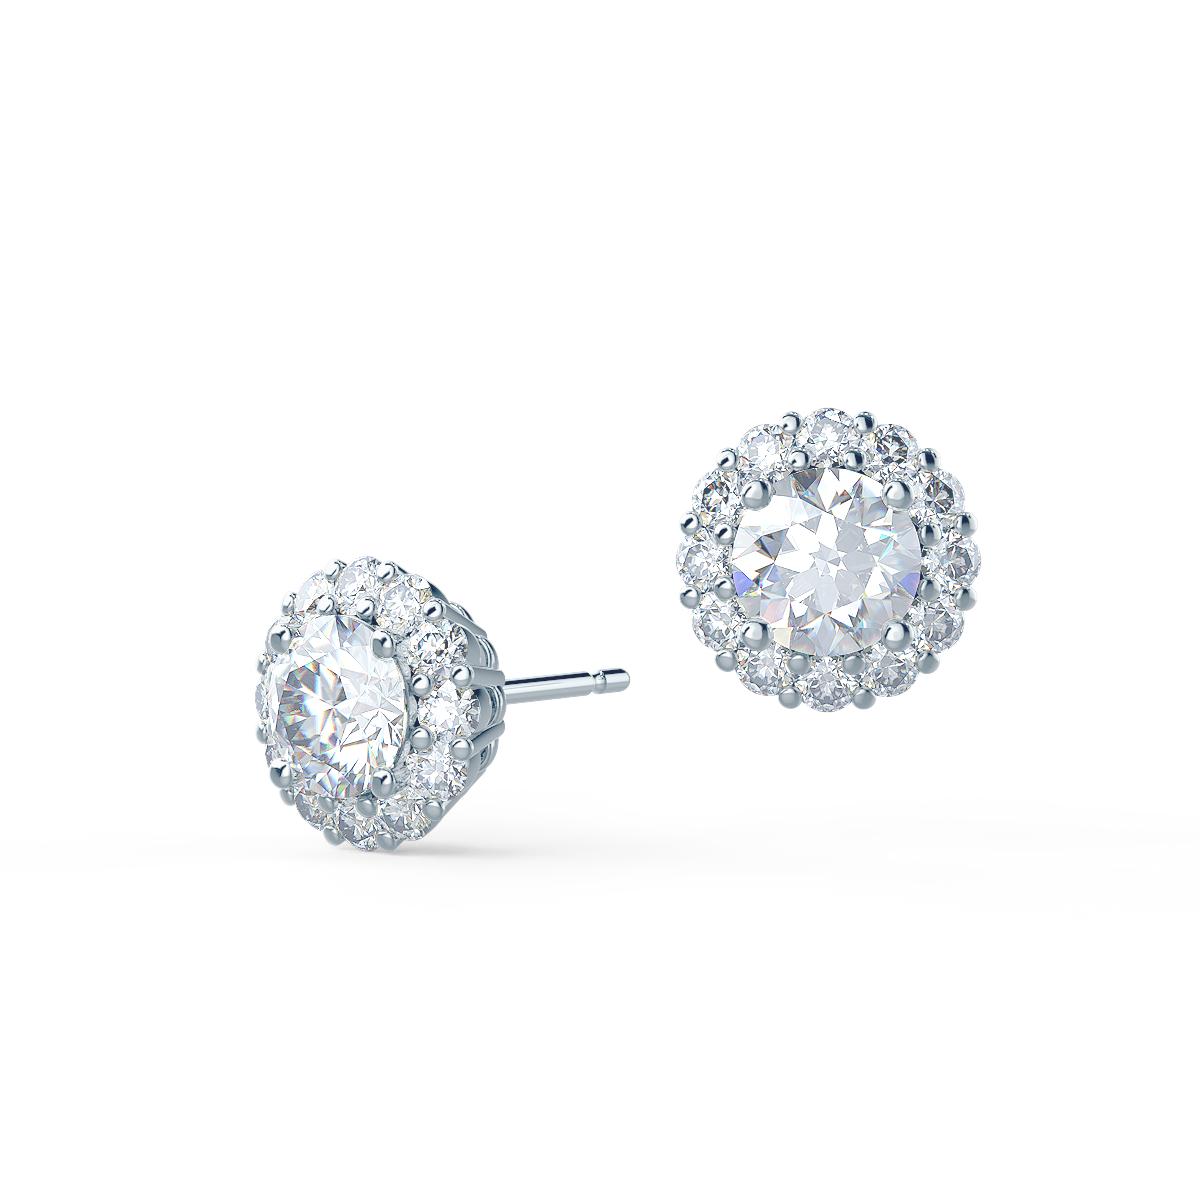 Lab grown diamond round brilliant earrings